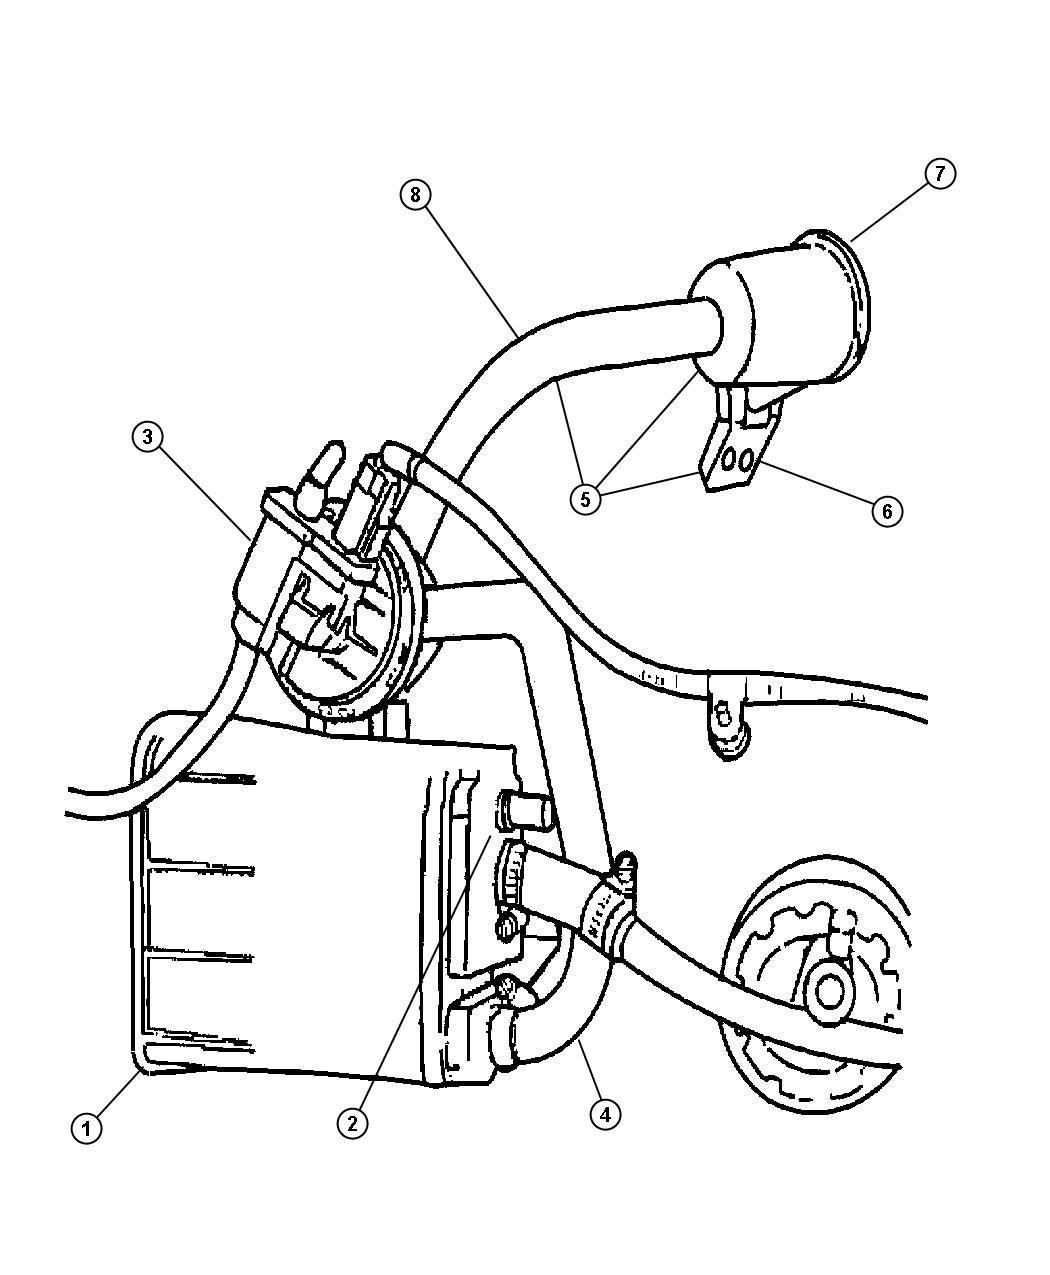 2007 Dodge NITRO Pump. Leak detection. Emissions, canister